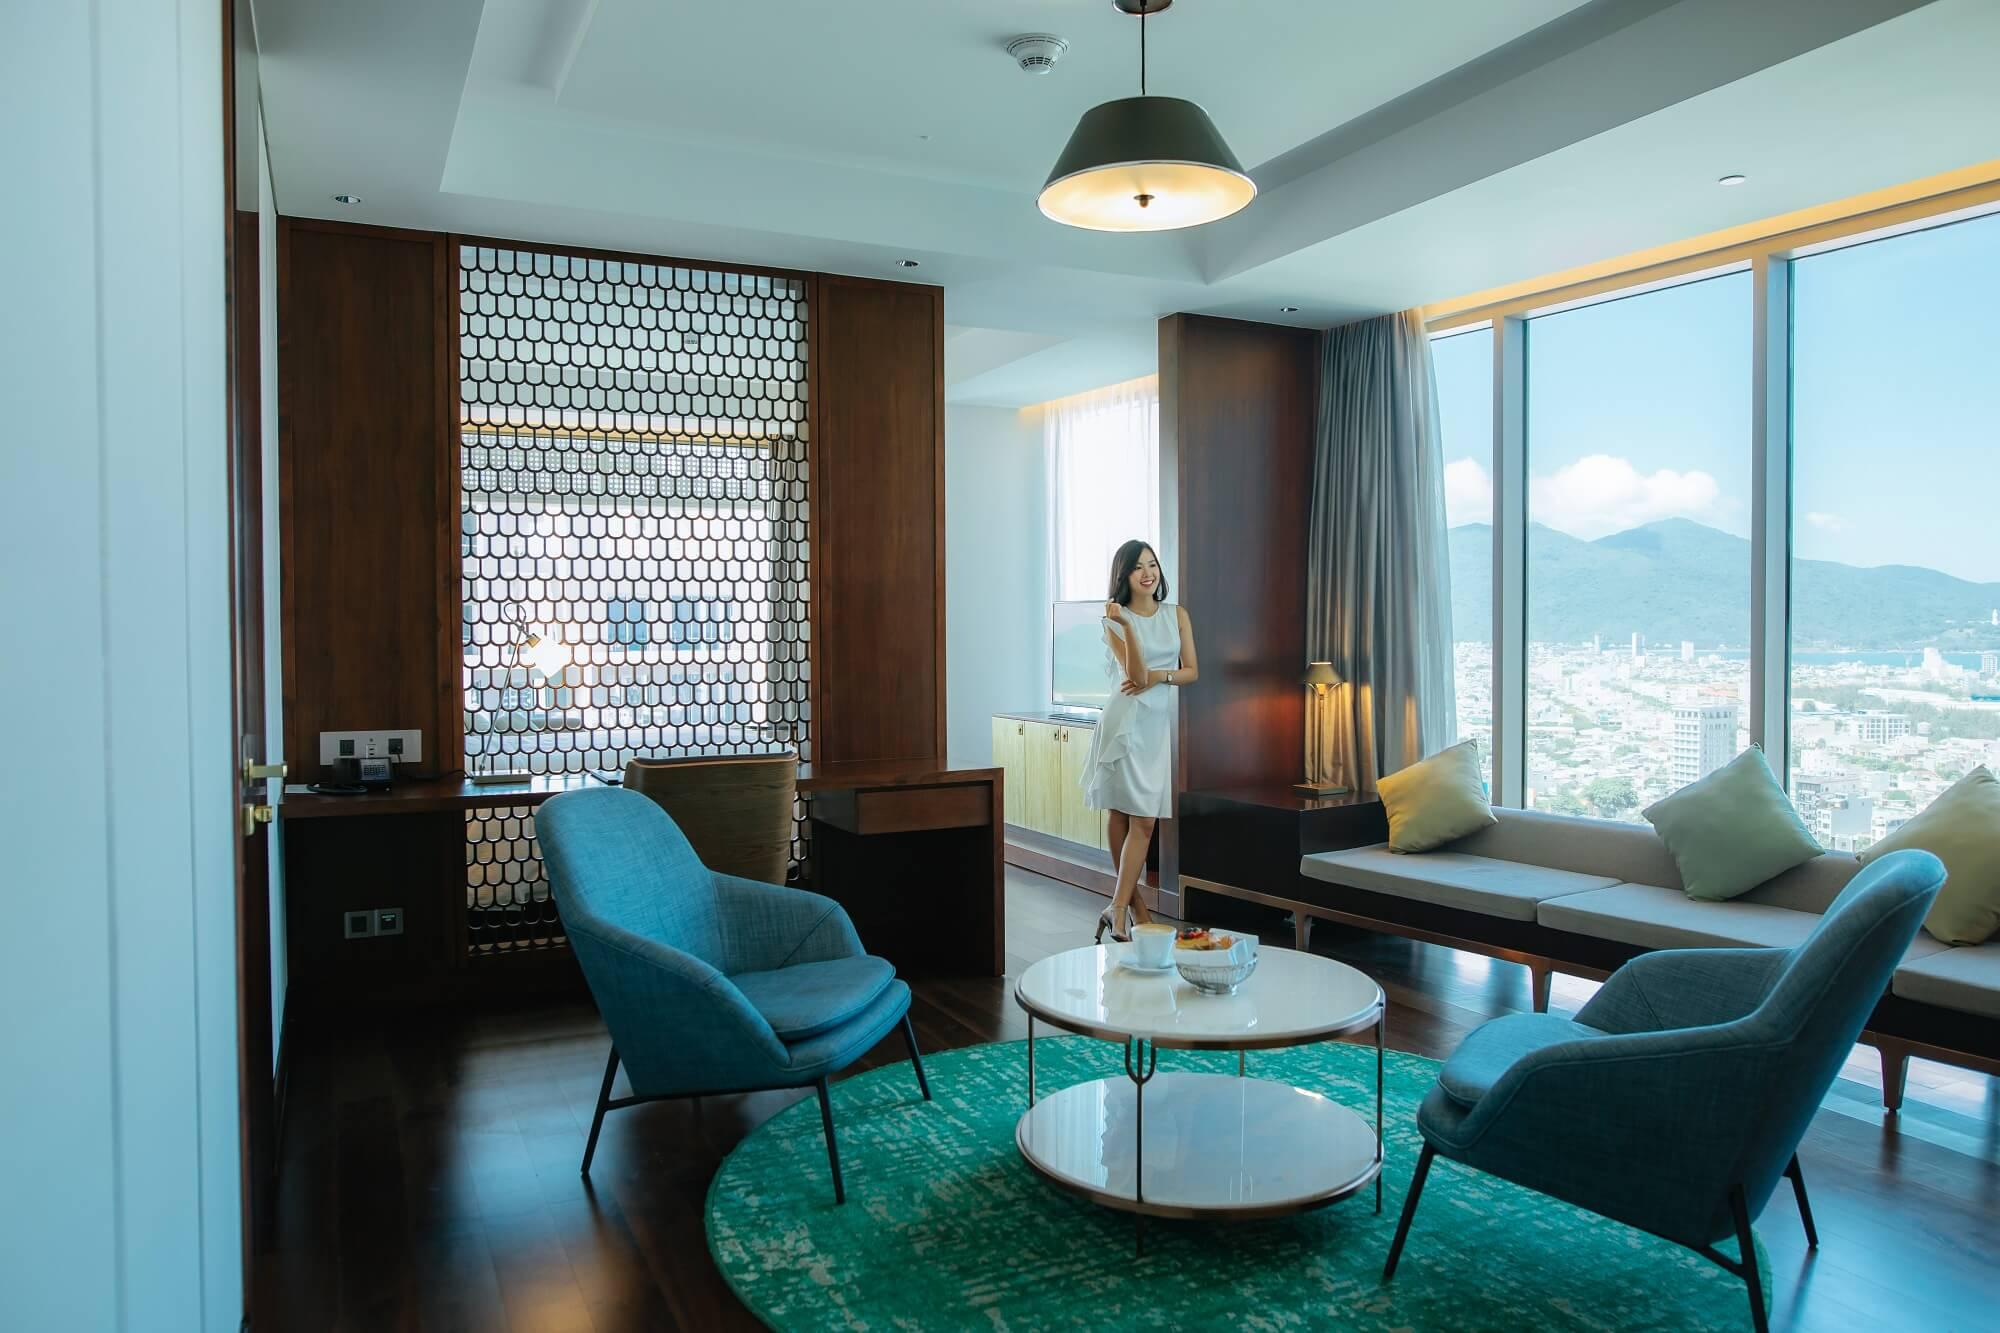 Suite Room Hilton Da Nang Trai Nghiem Khach San Day Phong Cach Giua Long Thanh Pho Danang Fantasticity07